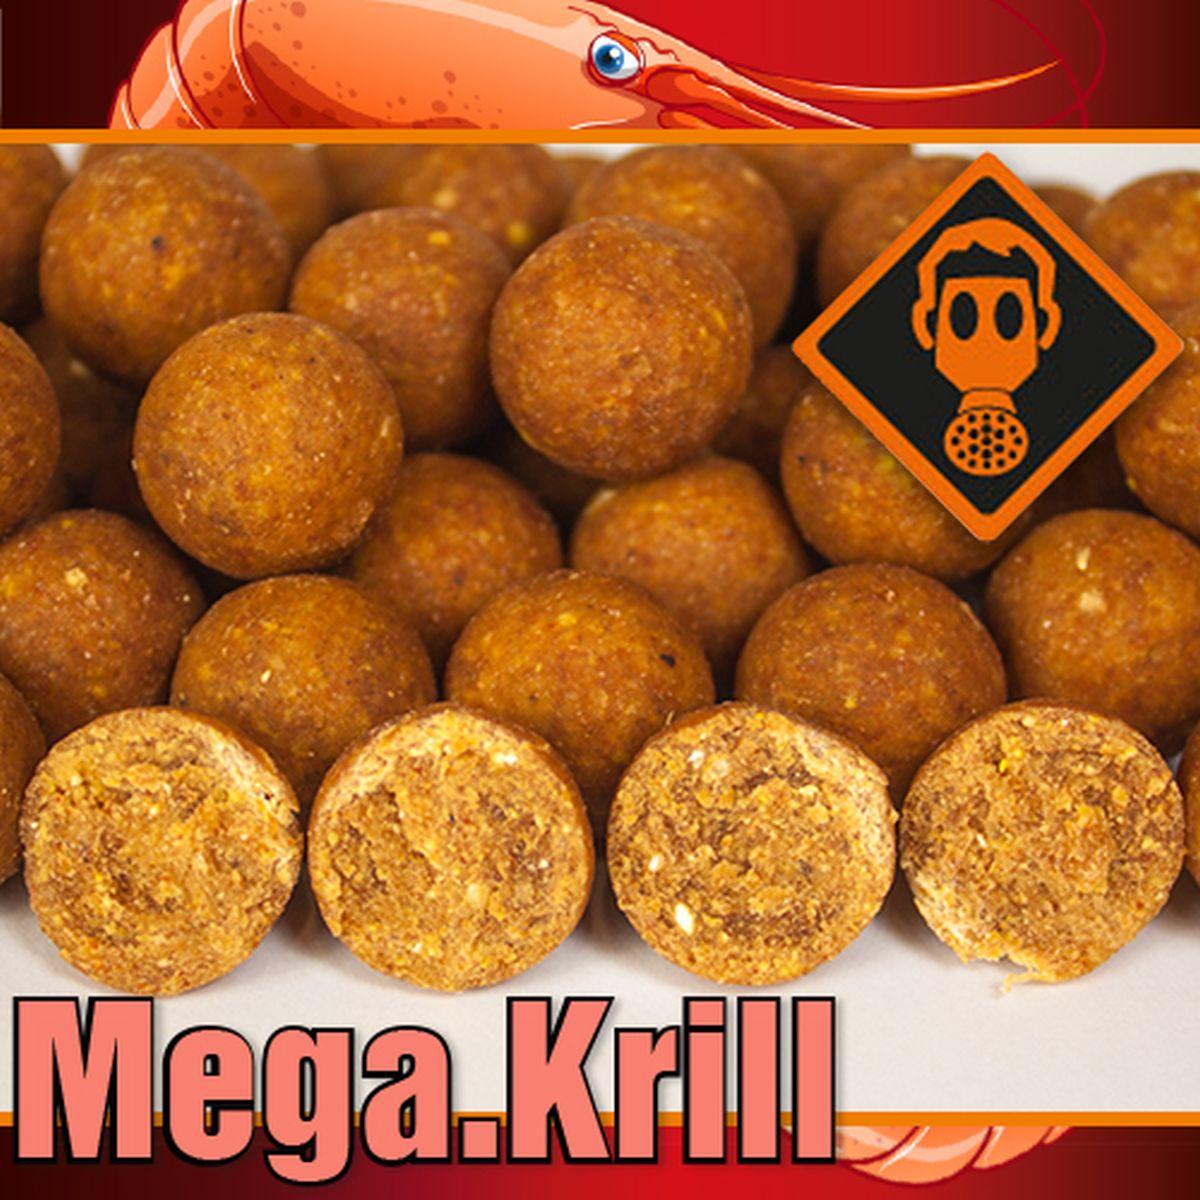 MegaKrillpromoweb - Druck, Drive und Dicke